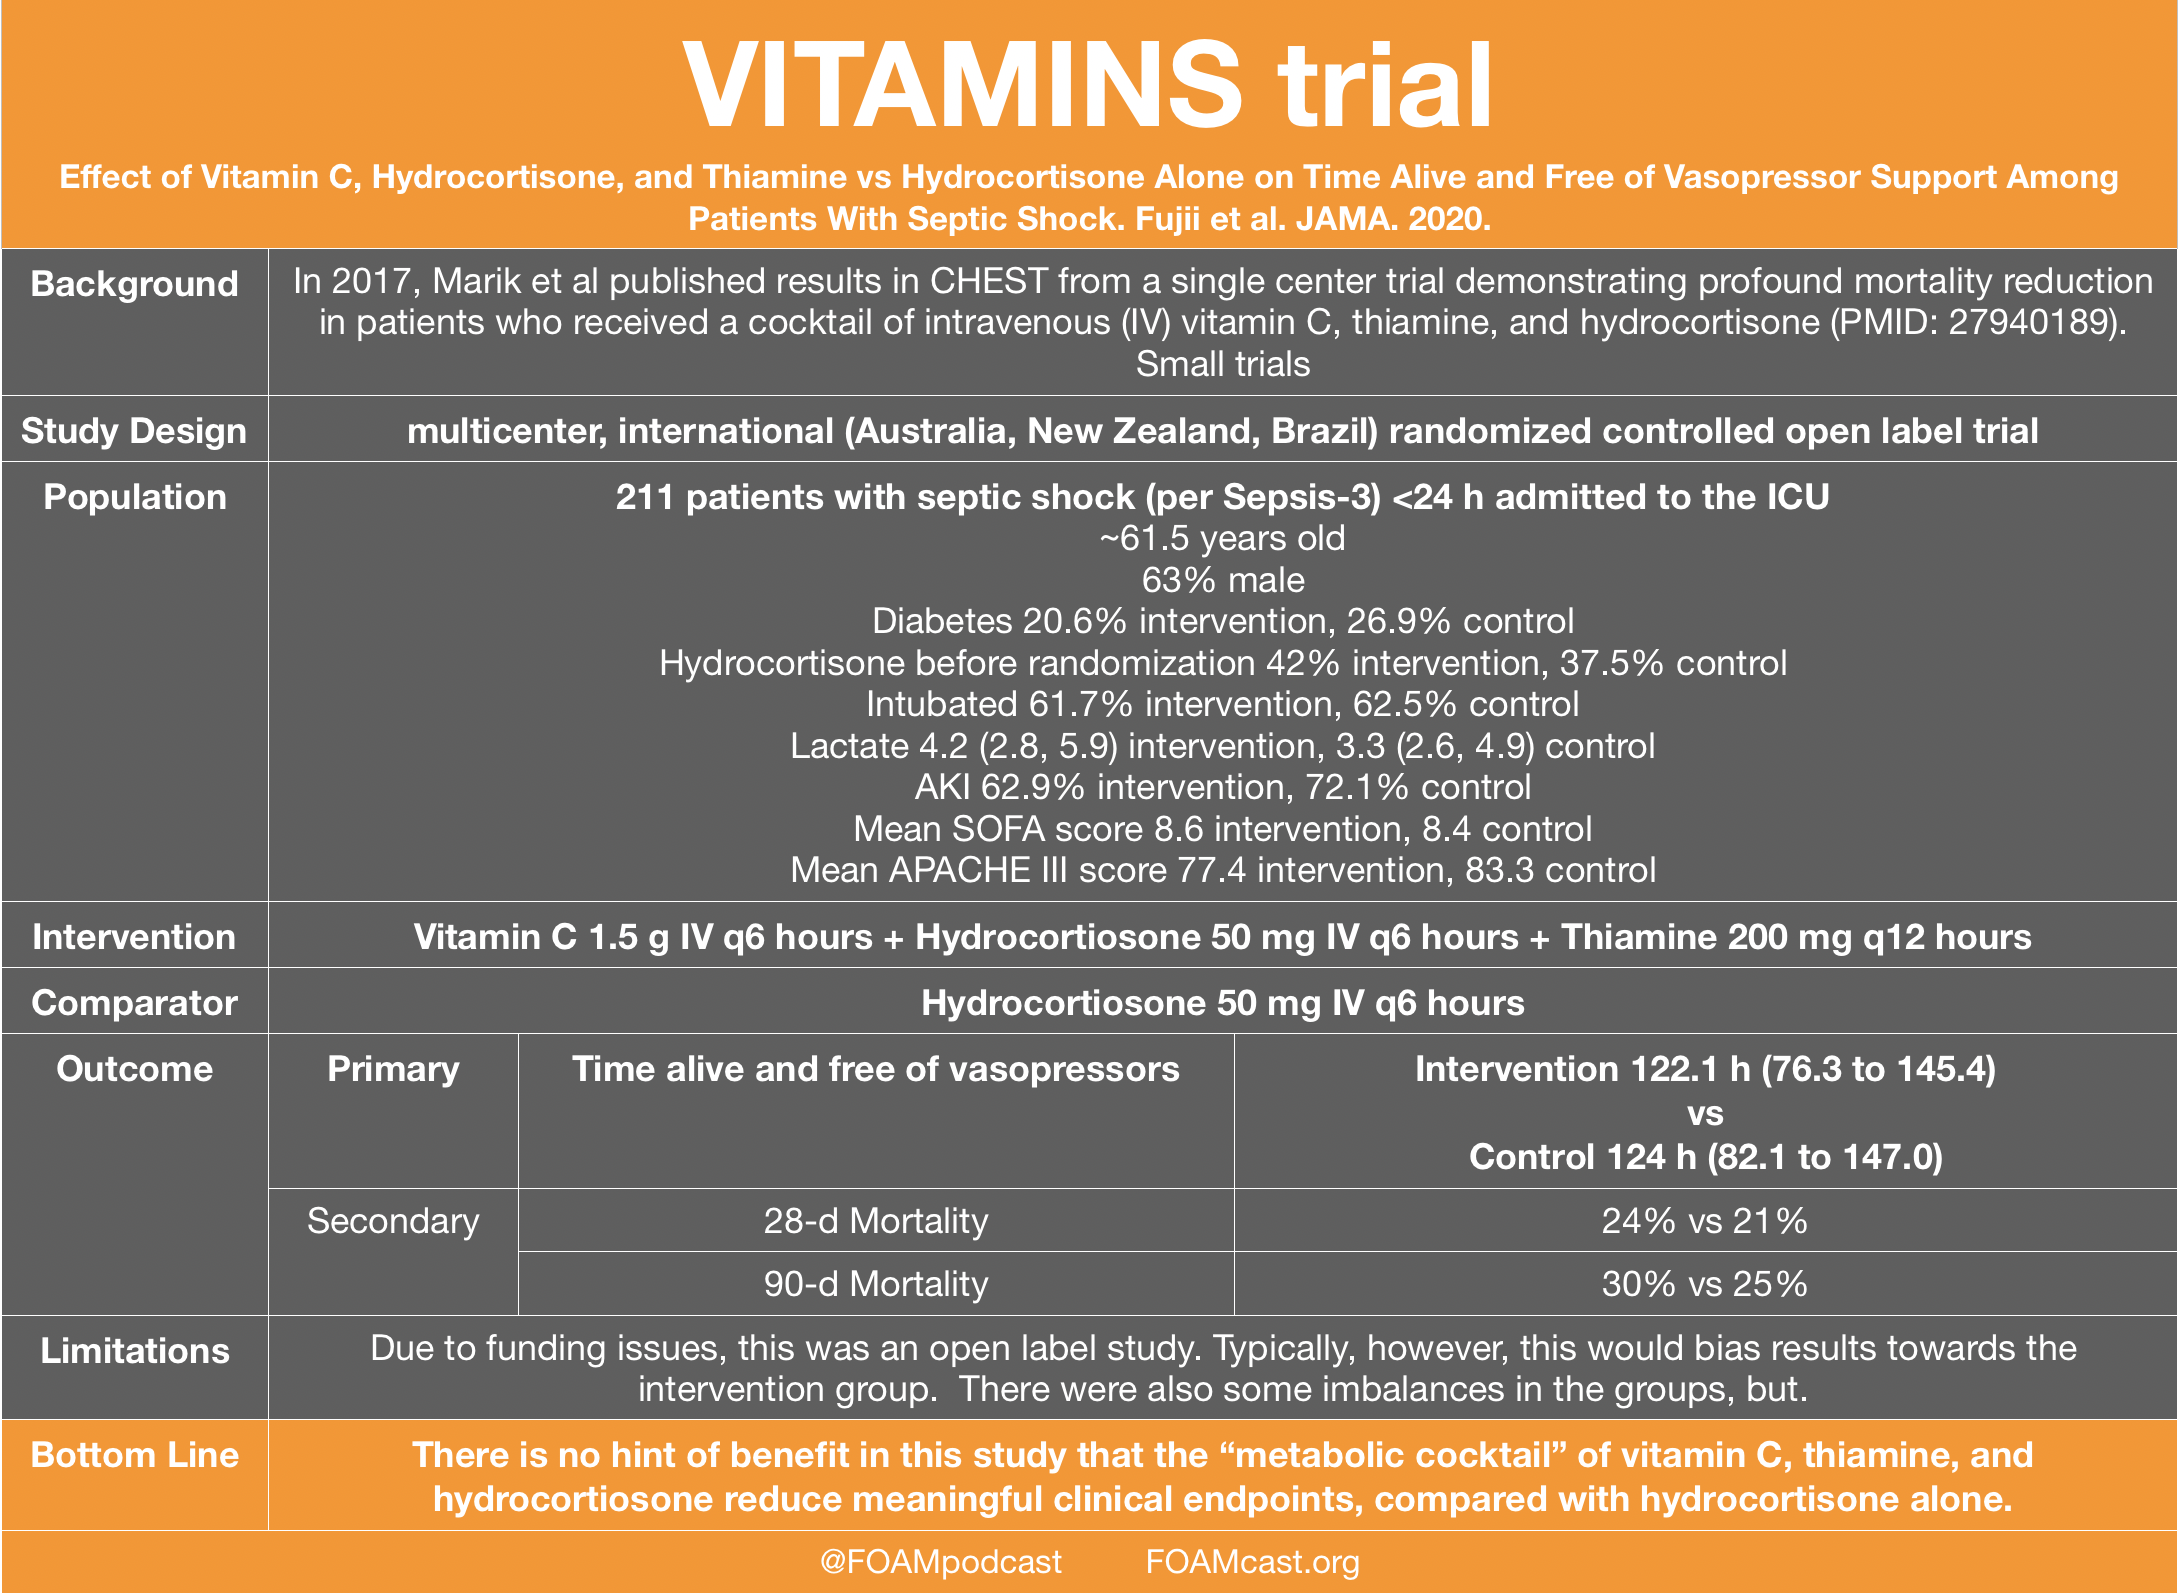 Vitamins Trials Vitamin C Hydrocortisone Thiamine In Septic